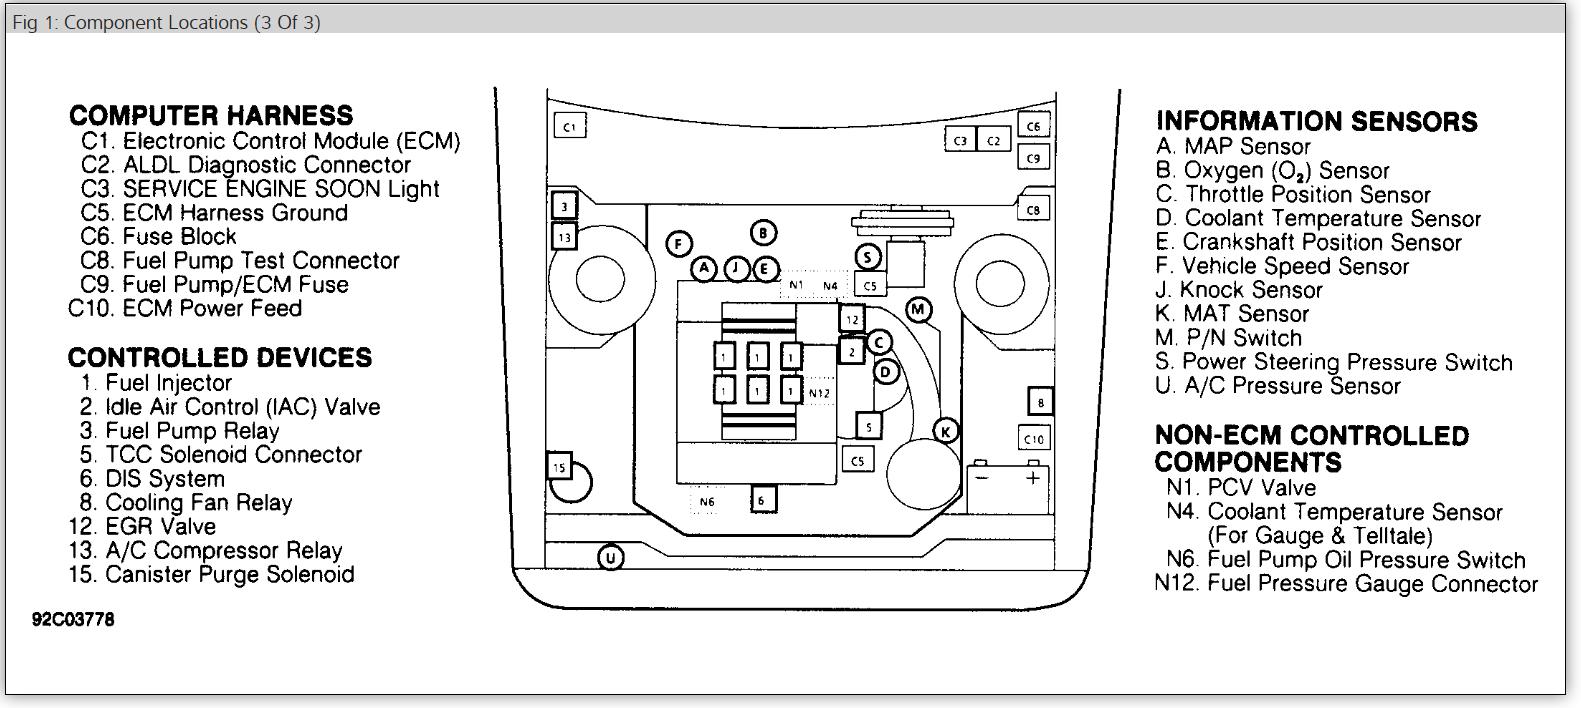 32 2000 Chevy Cavalier Radiator Diagram